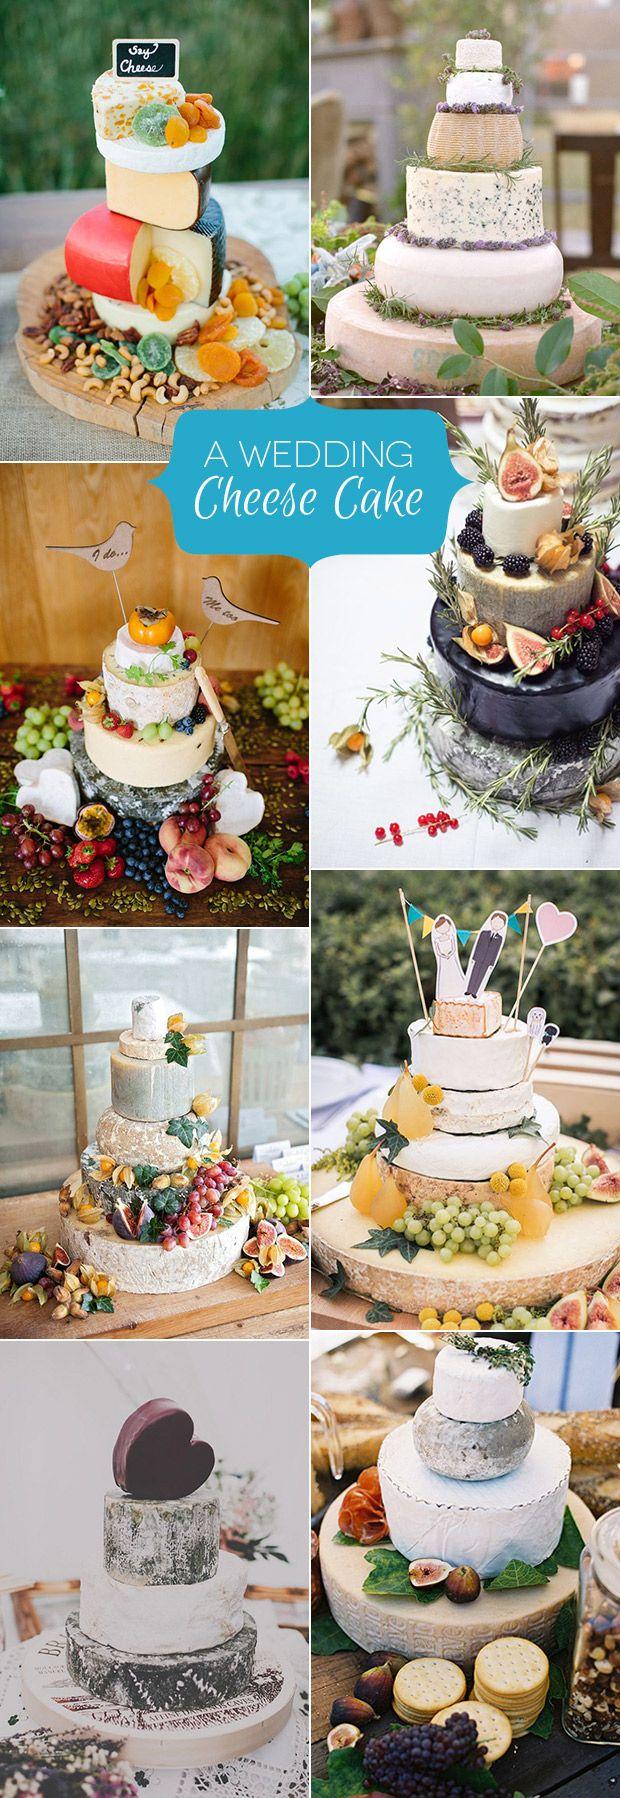 Yum! An Alternative Cake Idea - A Wedding Cheese Cake | www.onefabday.com